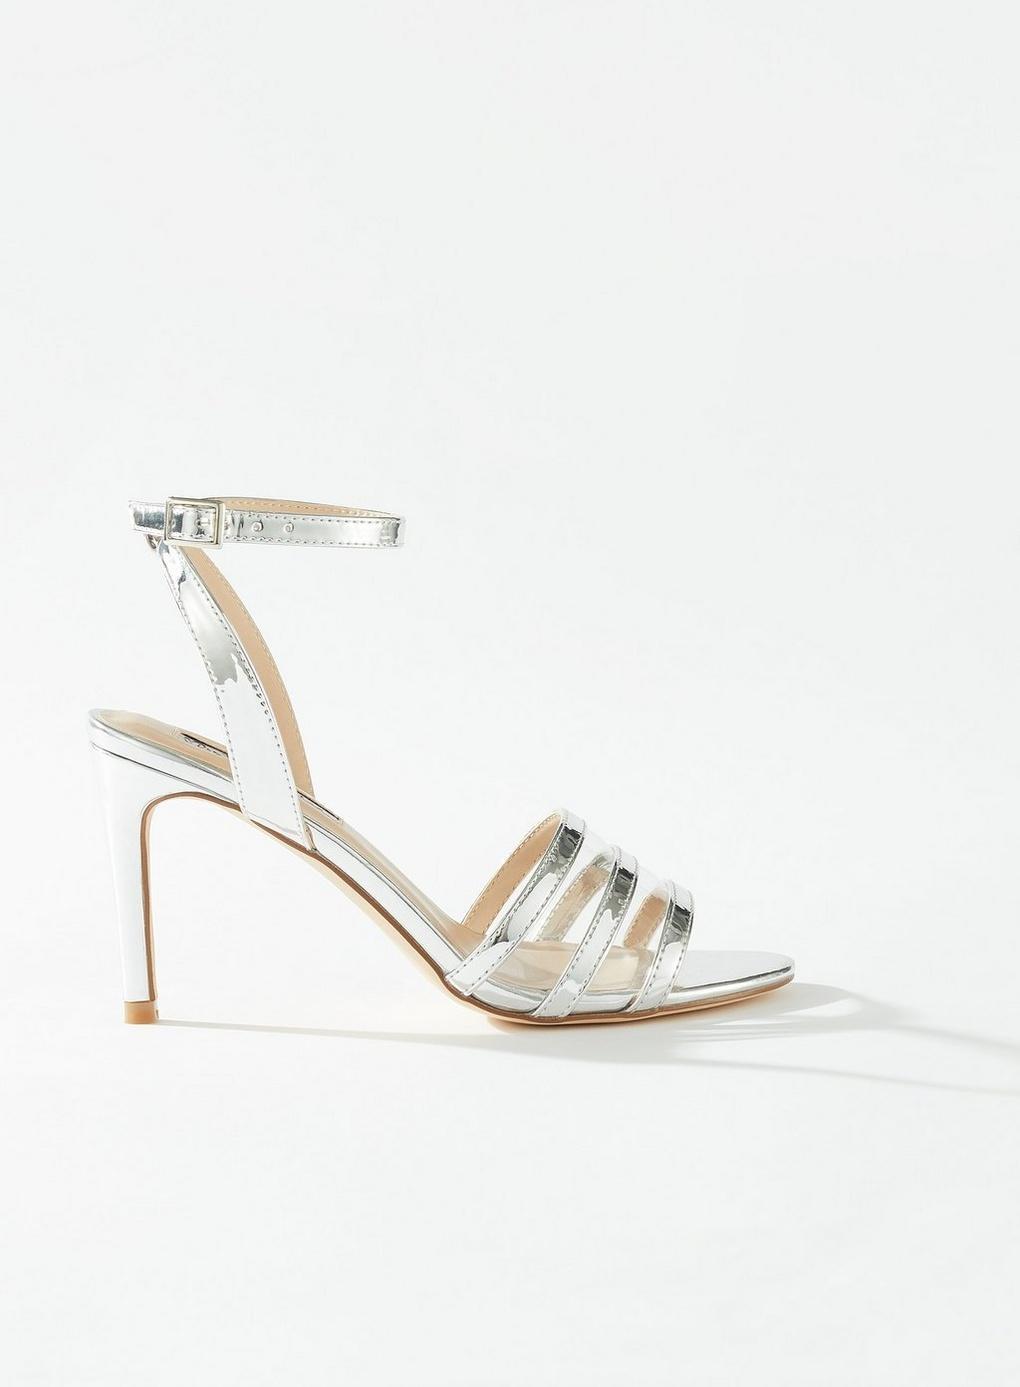 73e30c51ad6c Miss Selfridge Sentara Silver Perspex Heel Sandals in Metallic - Lyst